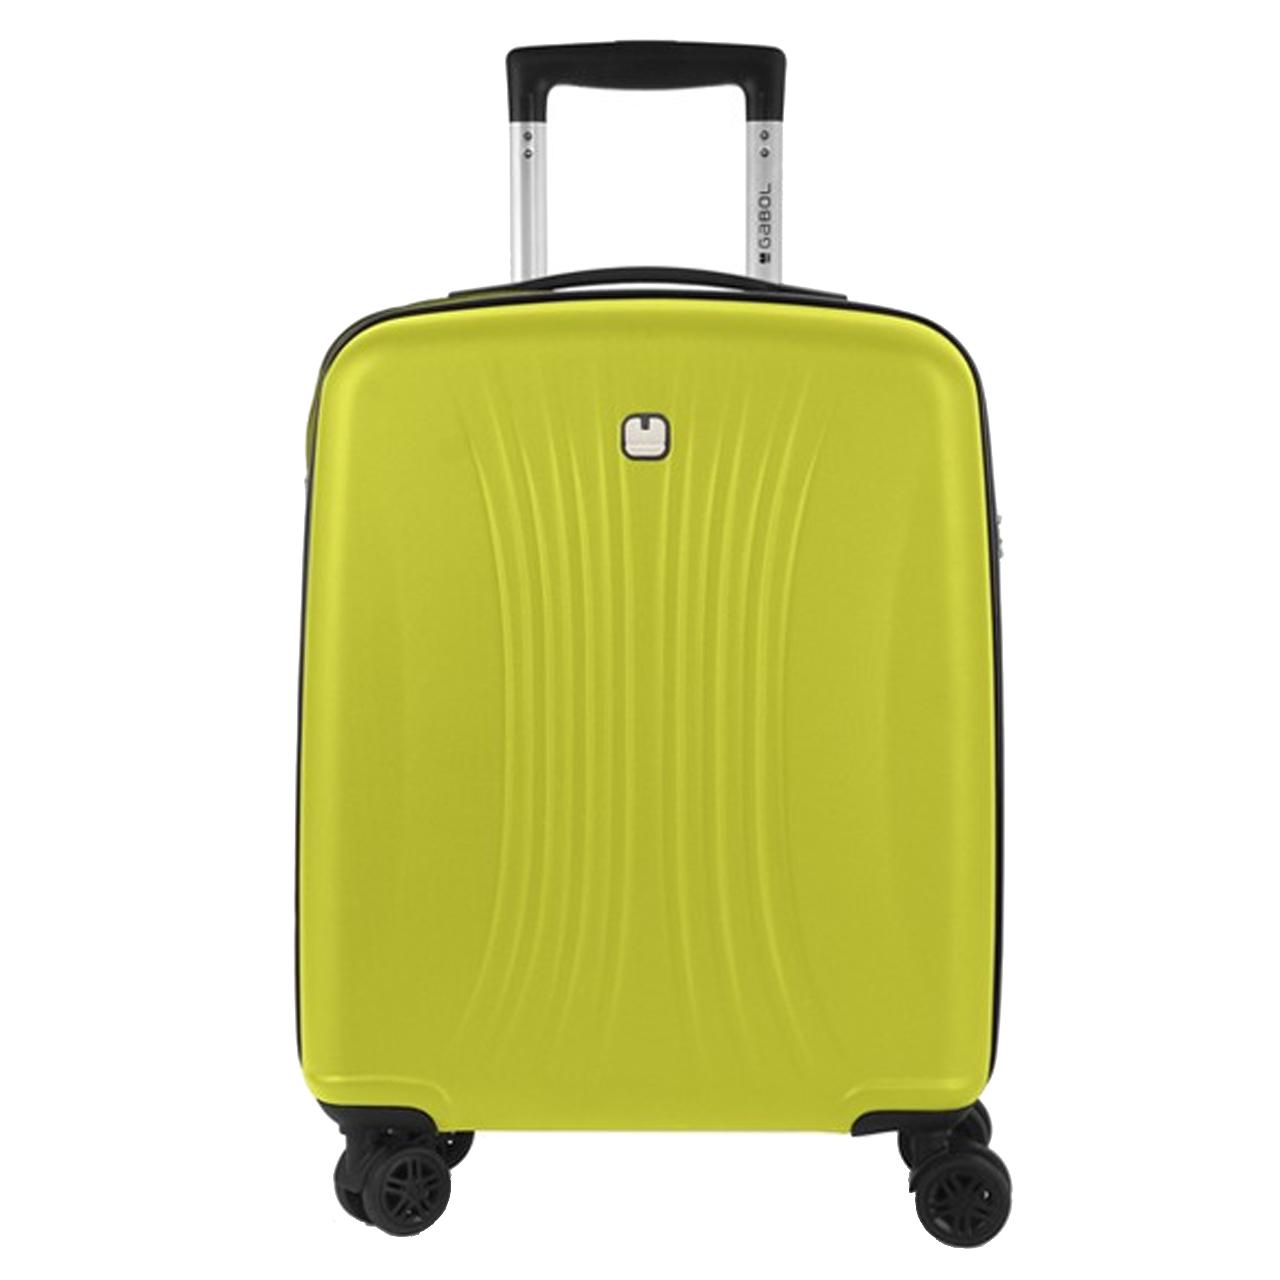 چمدان گابل مدل Fit سایز کوچک | Gabol Fit Luggage Small Size